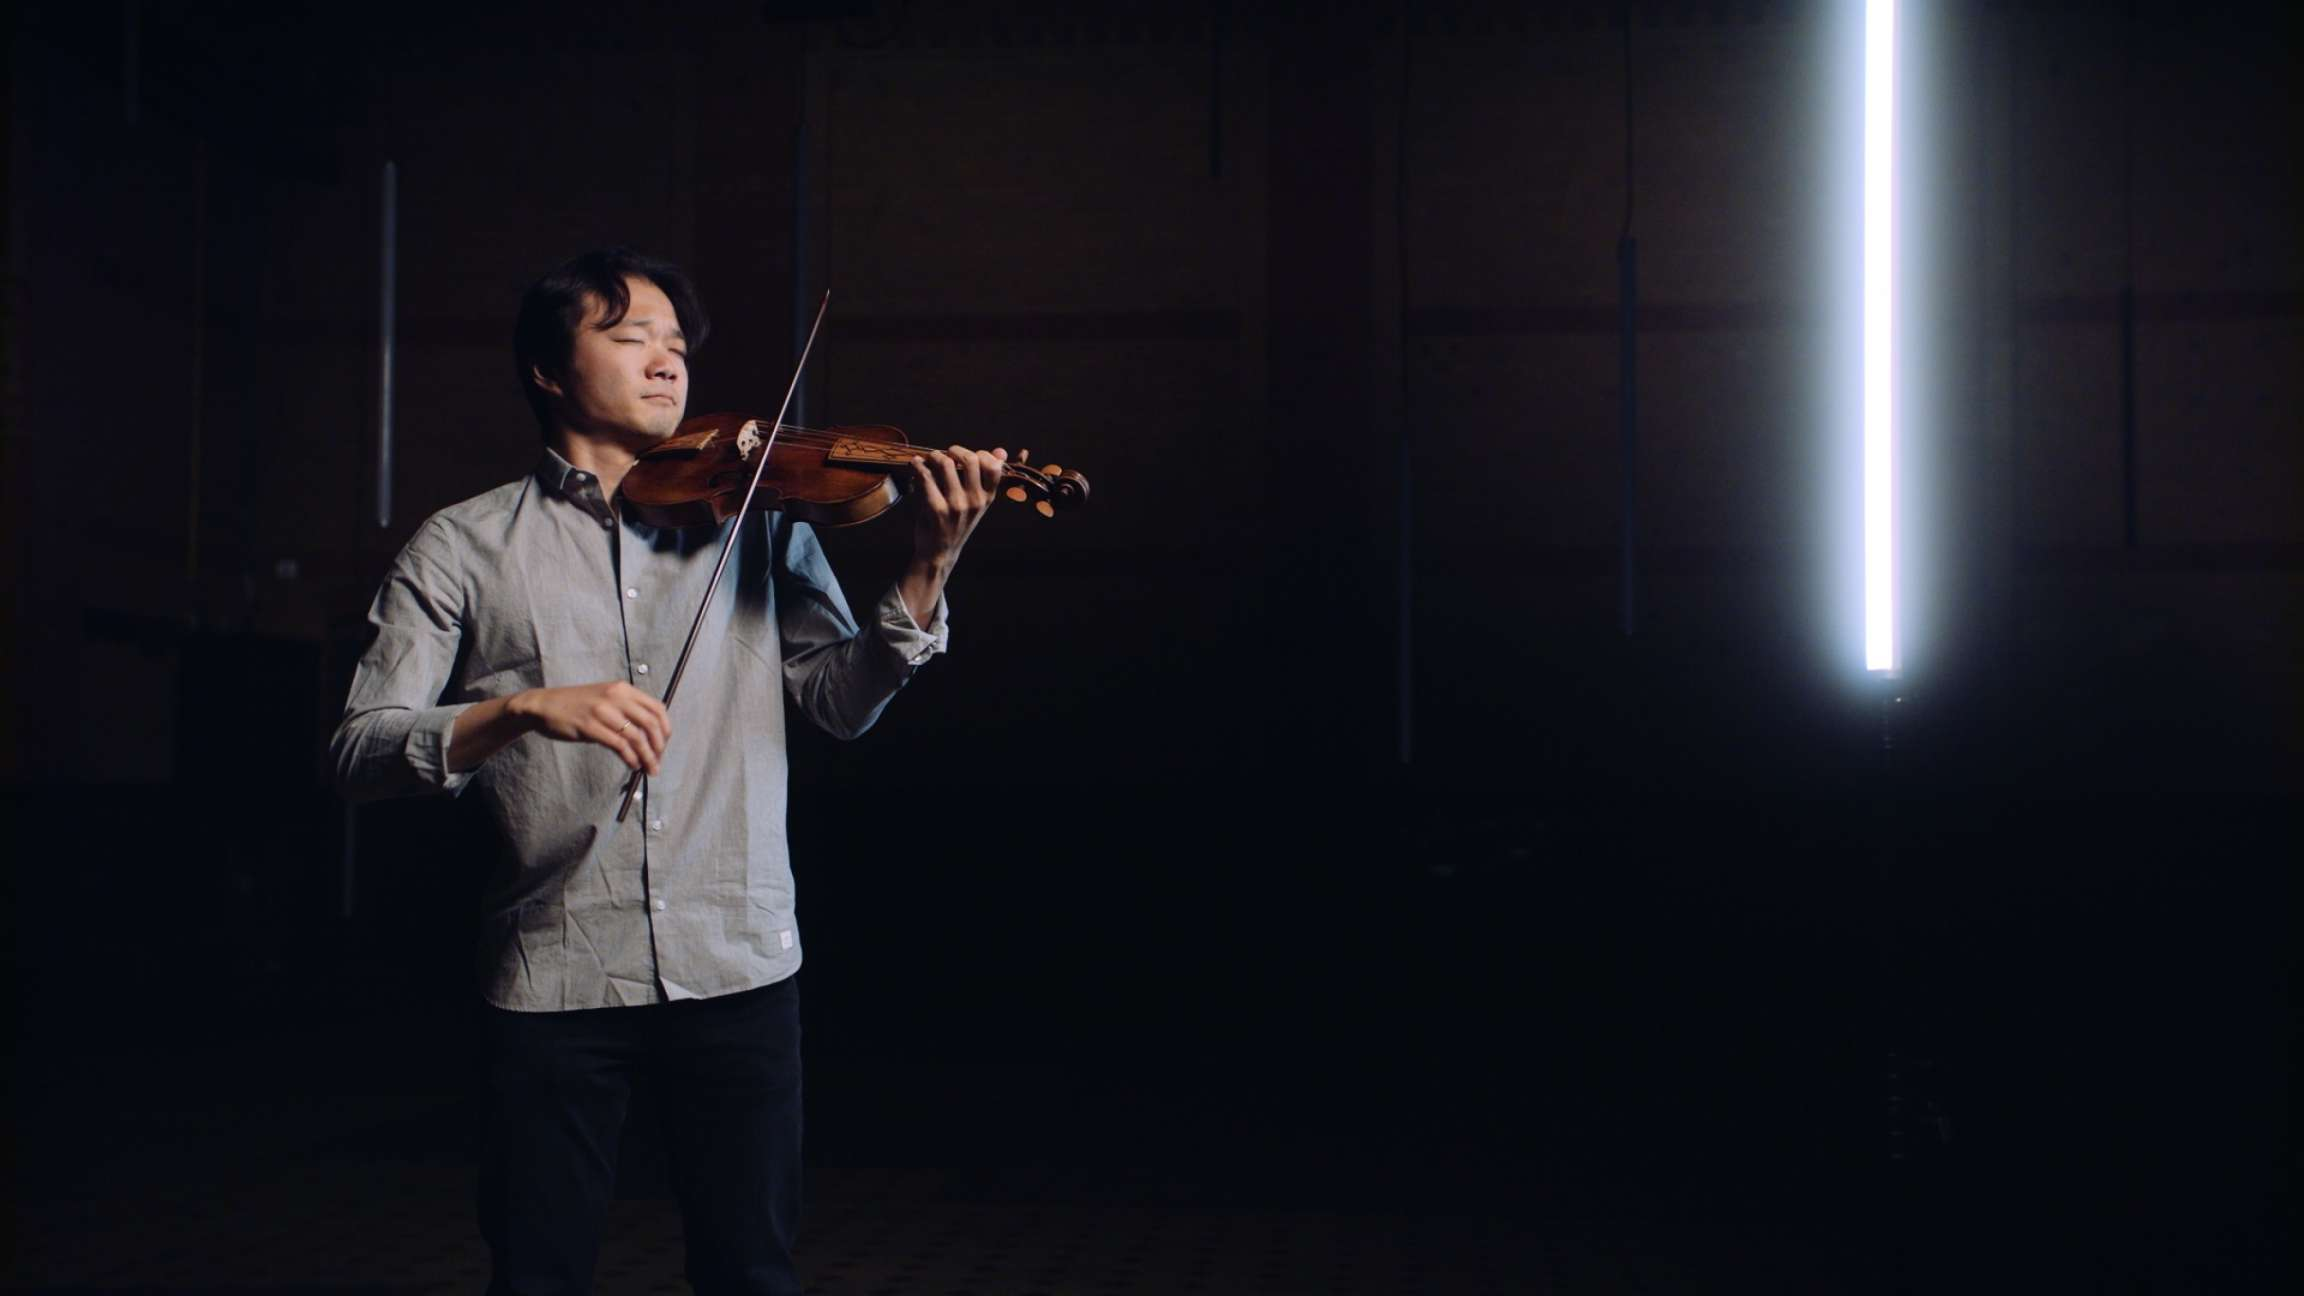 Violin Sonata no. 1 in G minor